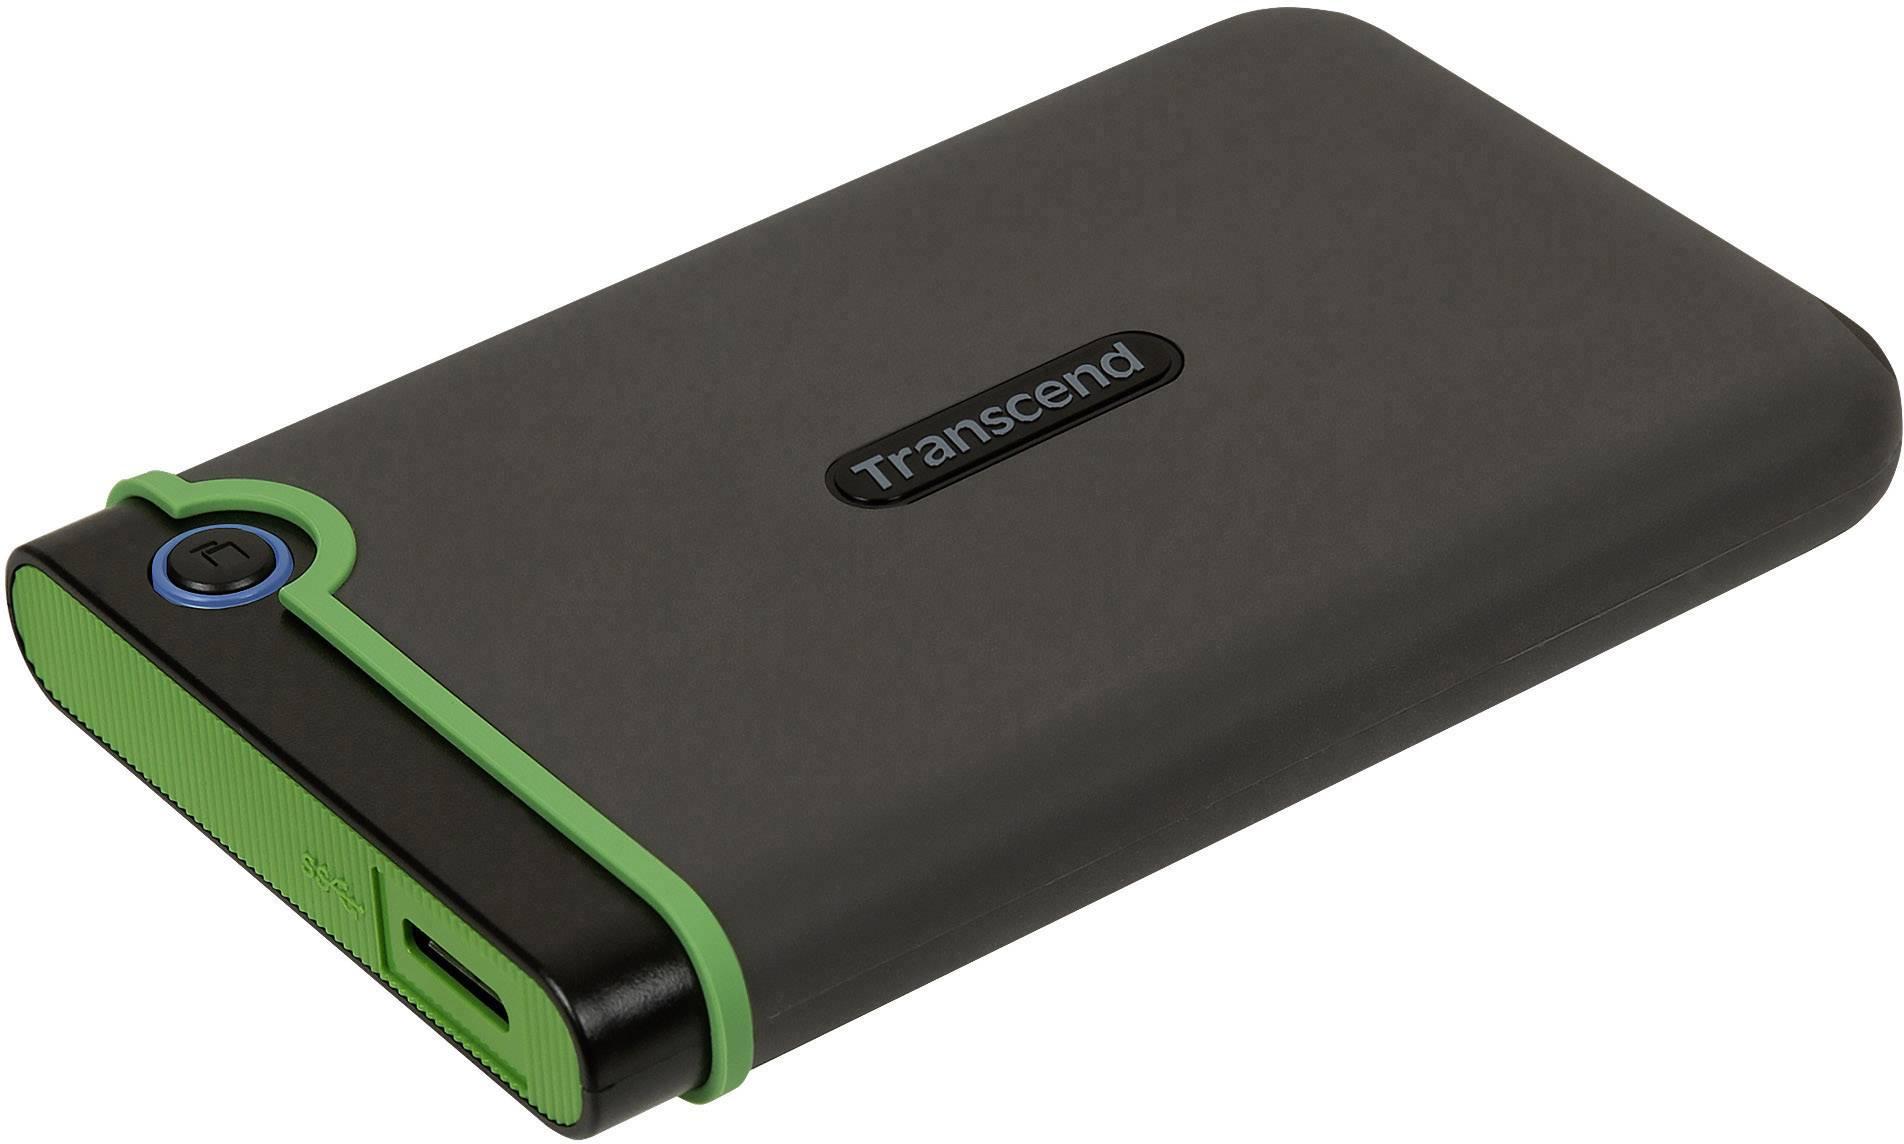 Transcend StoreJet 500GB Rugged USB 3.1 Slim External Portable Hard Drive